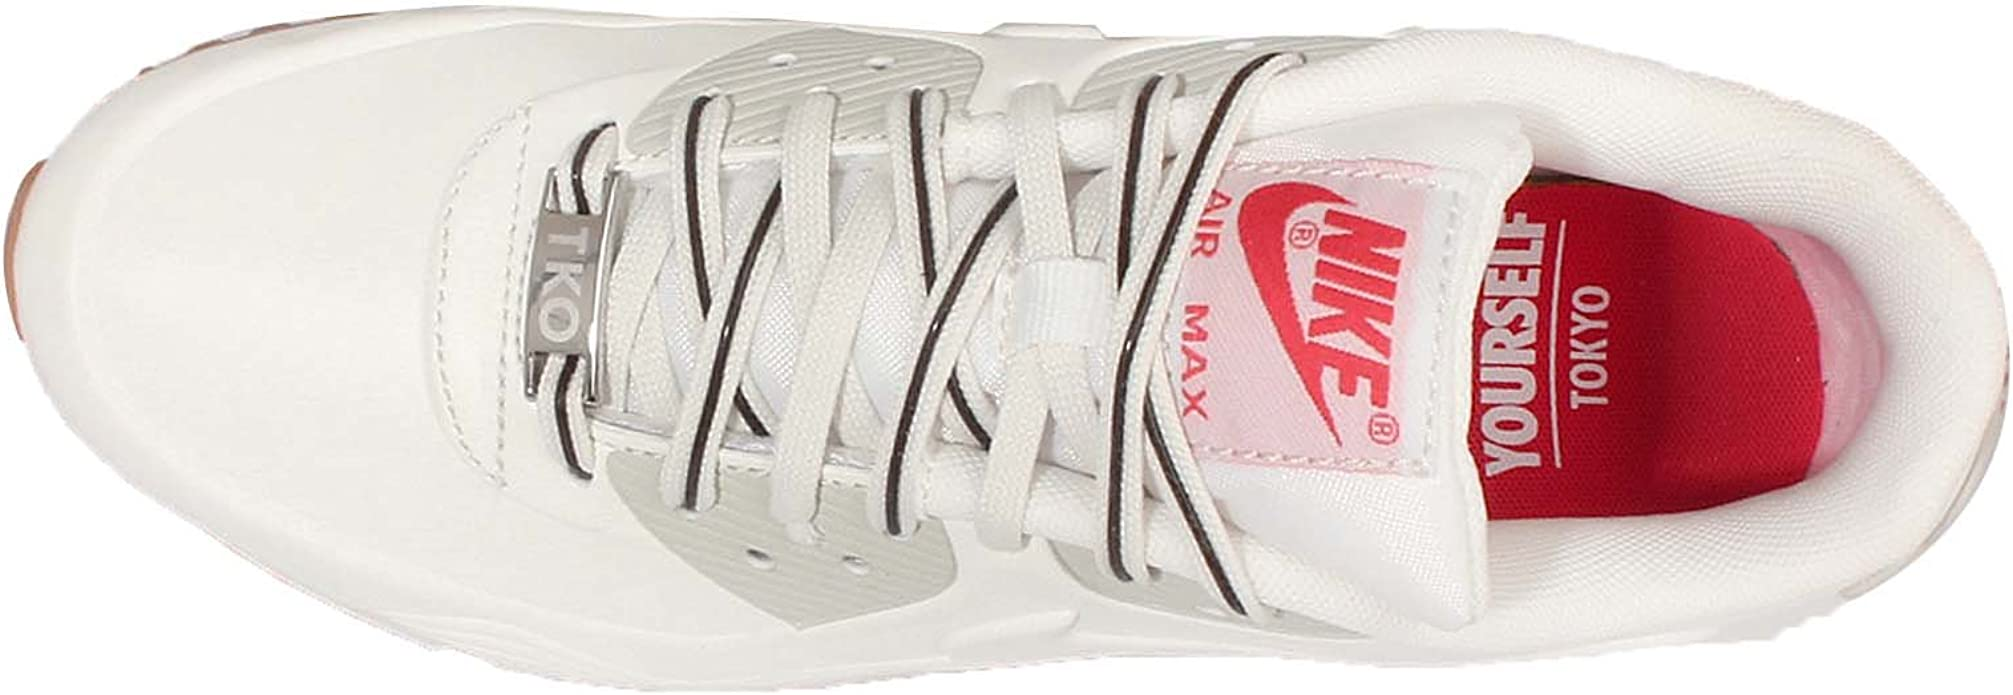 Nike Women's Air Max 90 VT (813153 100) 8: Amazon.it: Scarpe